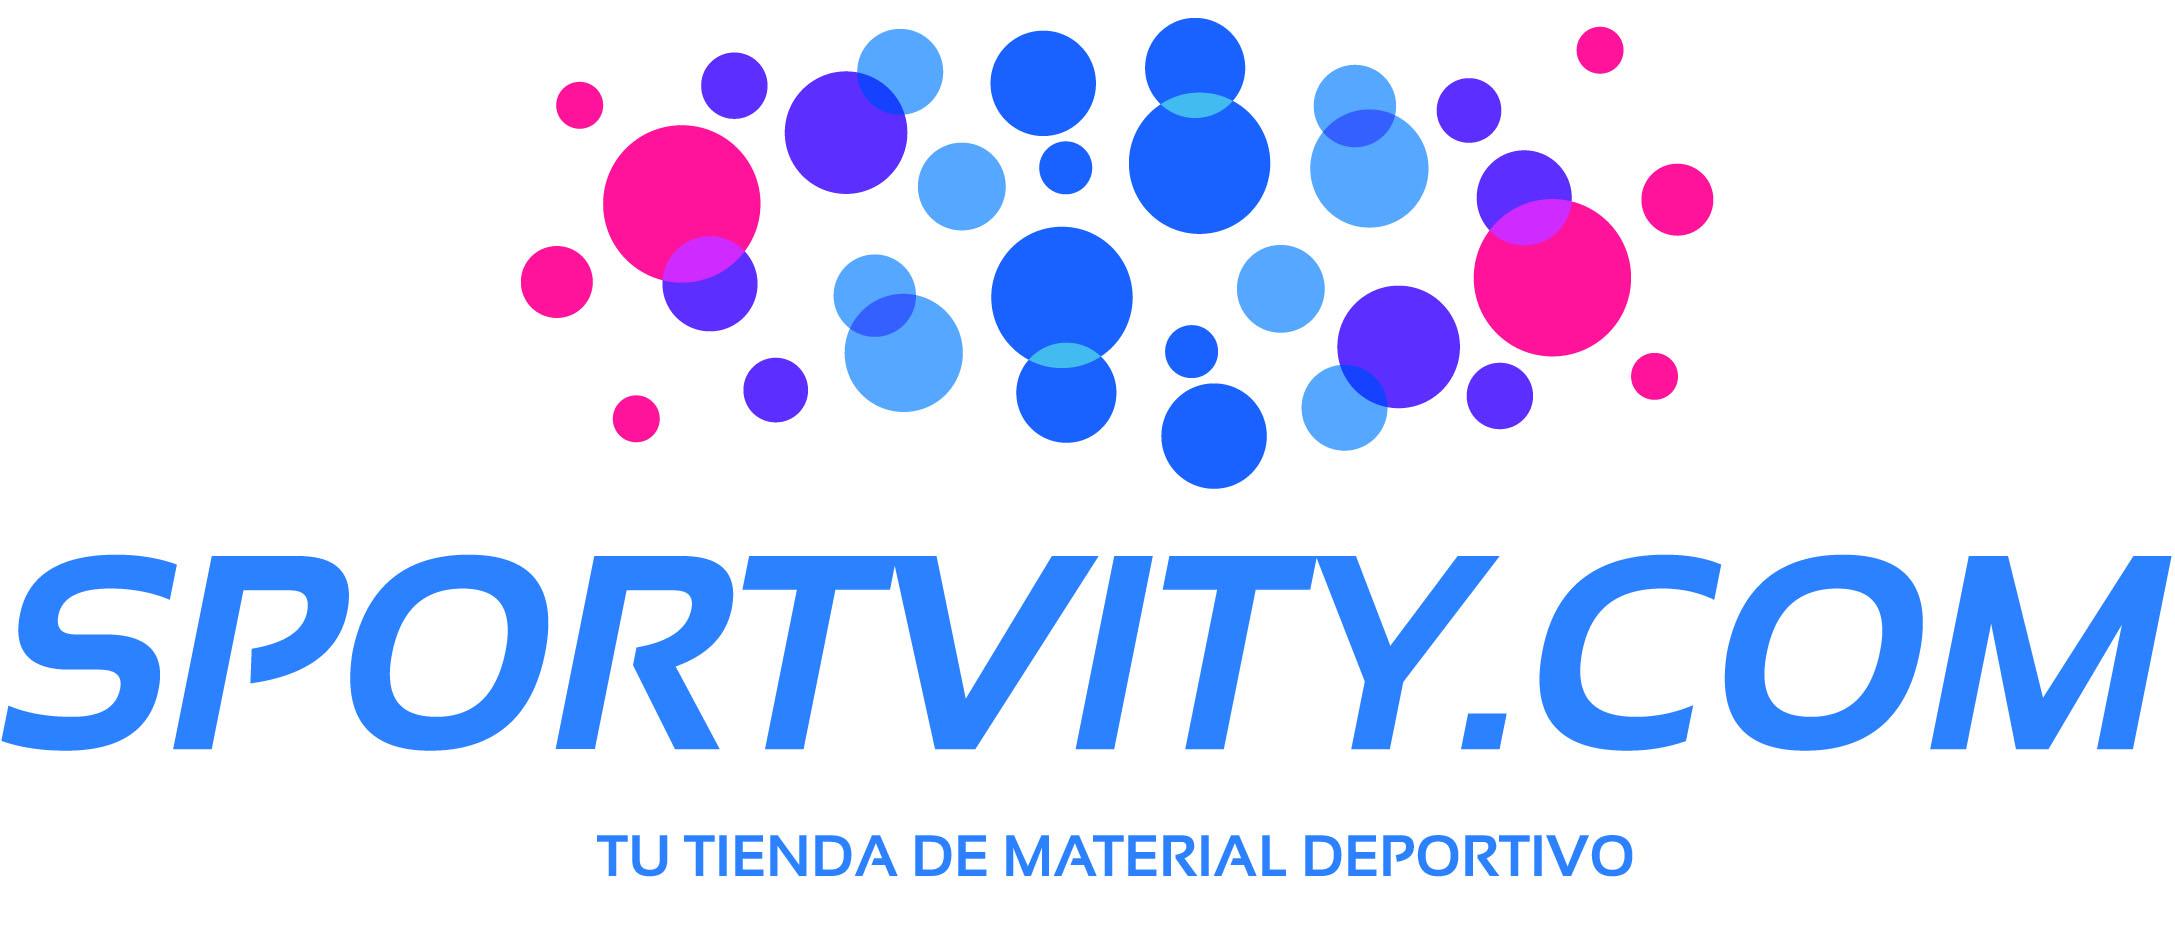 Sportivity_com_logo.jpg